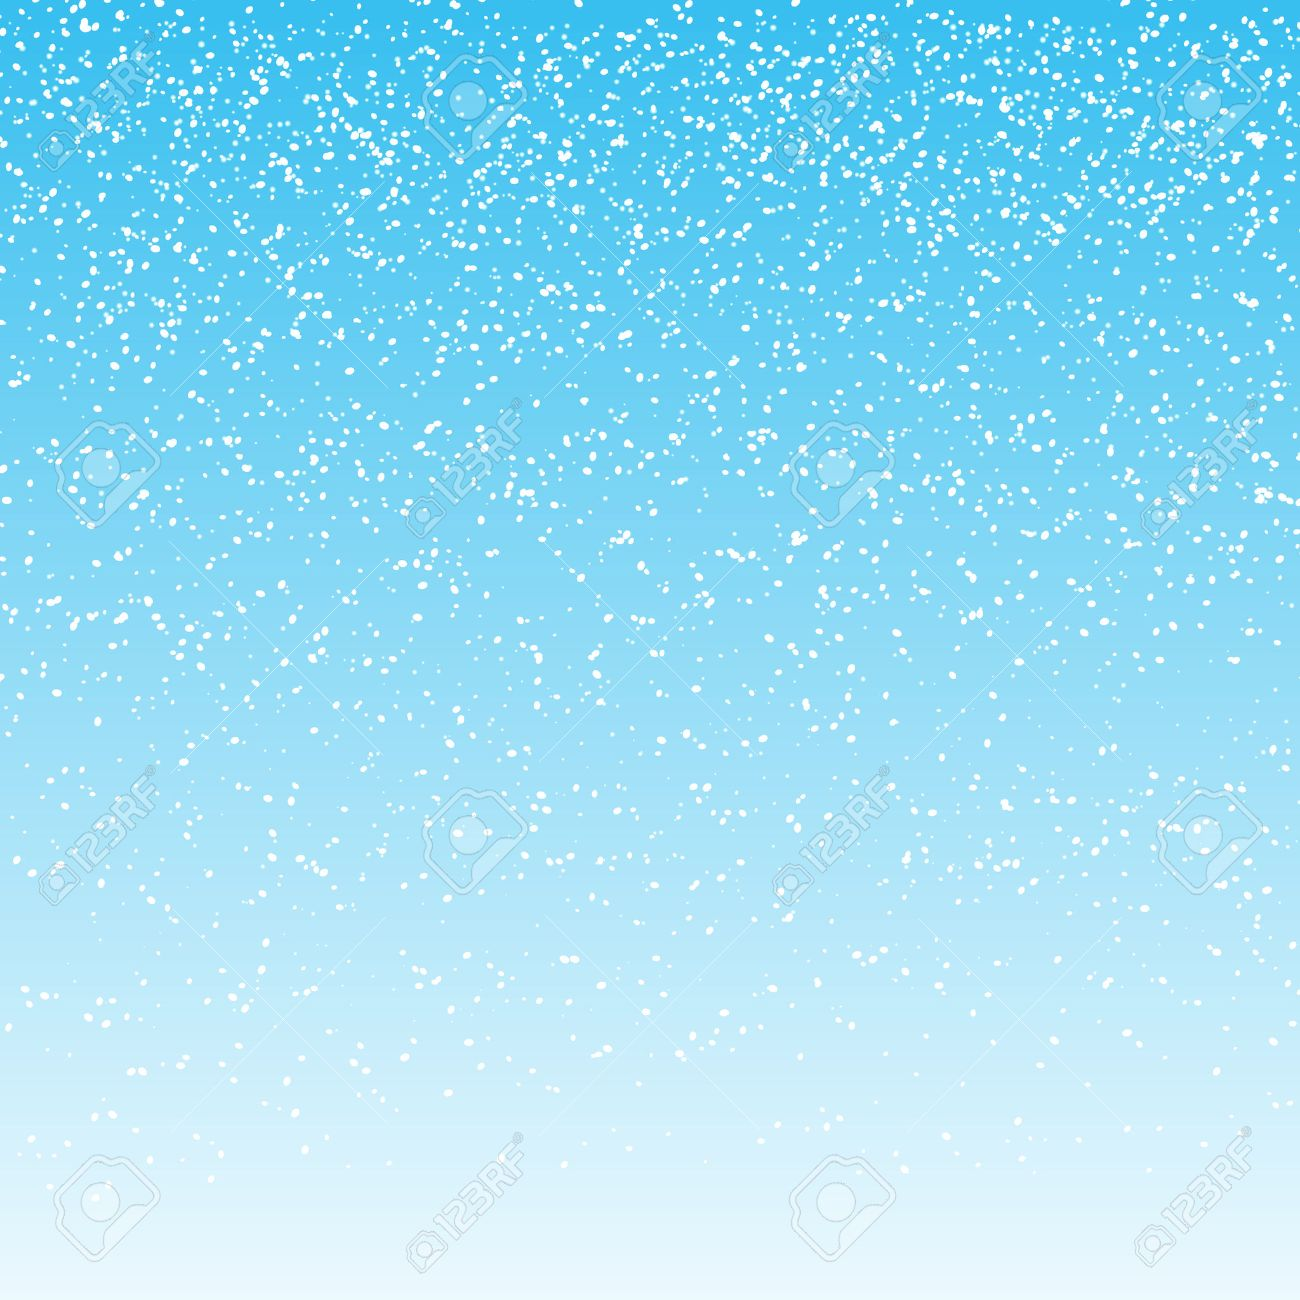 falling snow on light blue background. vector illustration - 50086529